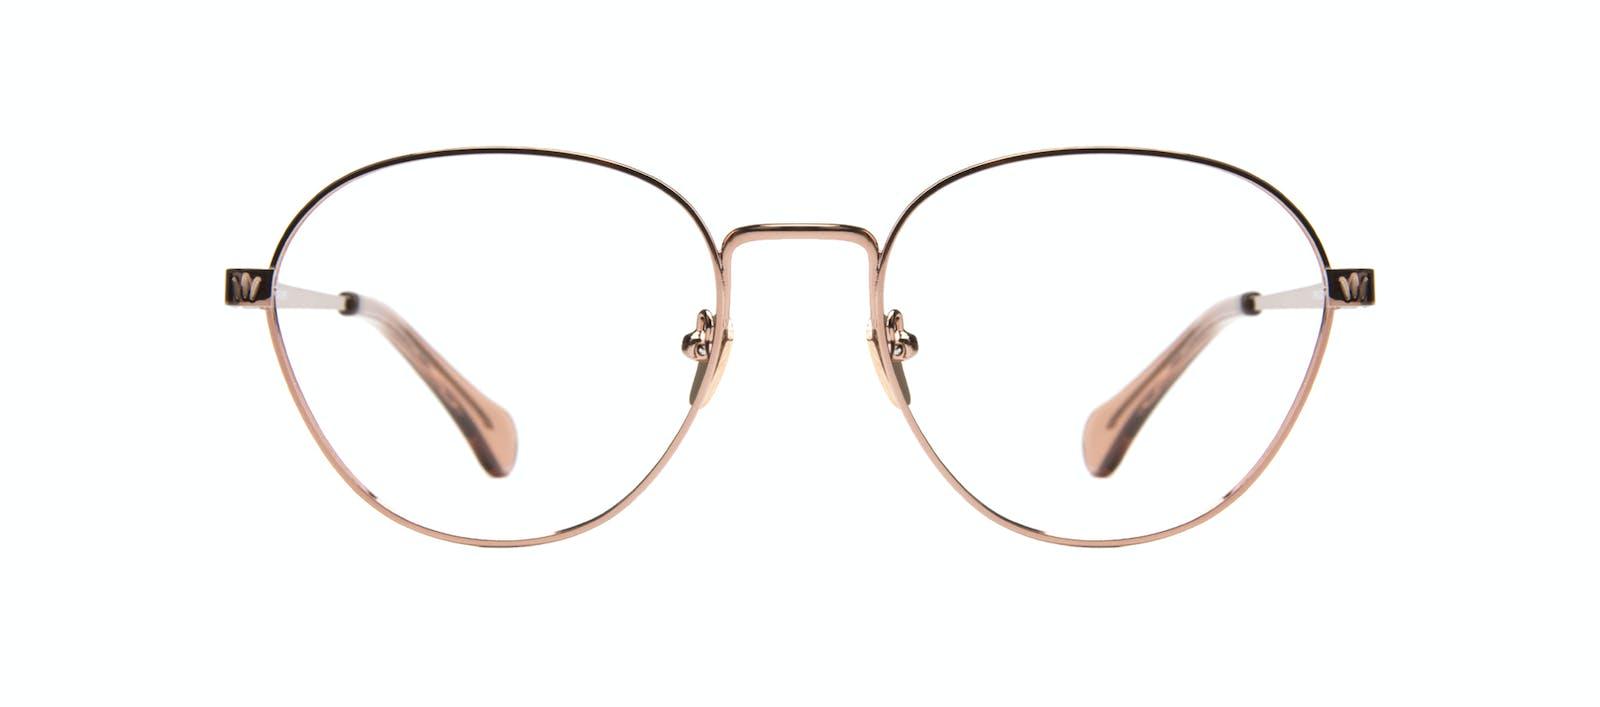 1471e9fa113d40 Affordable Fashion Glasses Round Eyeglasses Women Brace Rose Gold Face